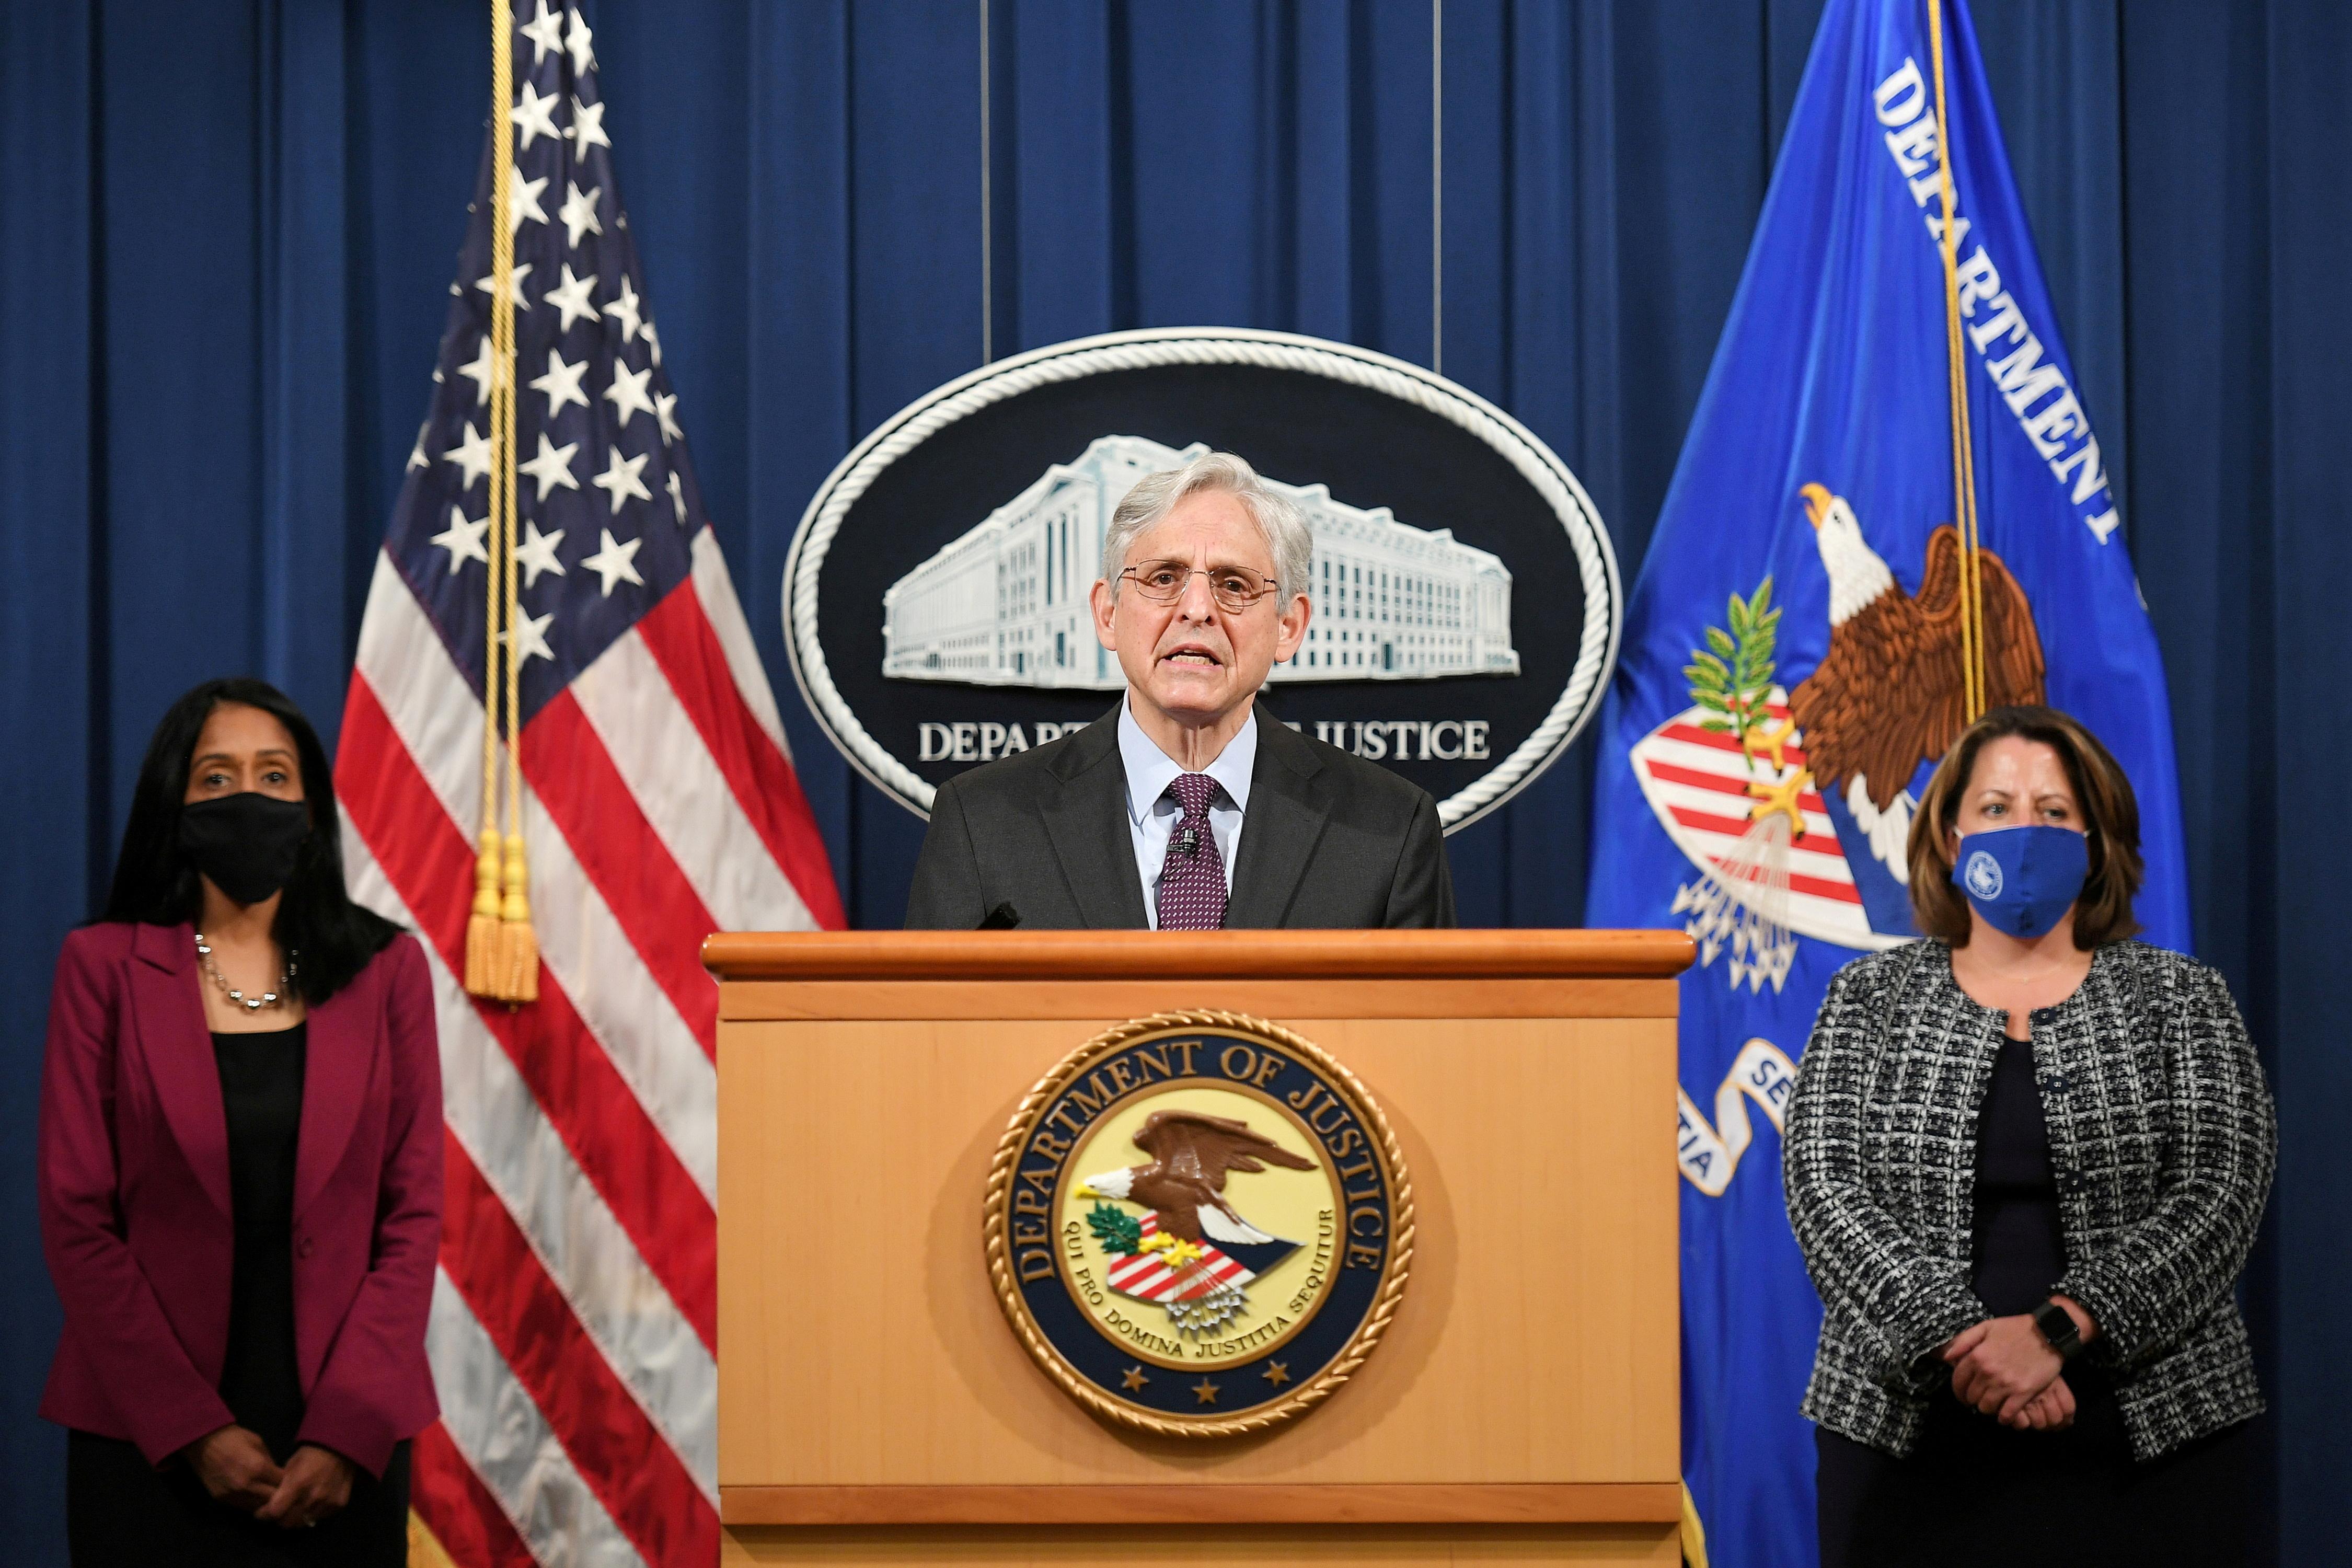 U.S. Attorney General Merrick Garland speaks at the Department of Justice in Washington, U.S. April 26, 2021. Mandel Ngan/Pool via REUTERS/File Photo